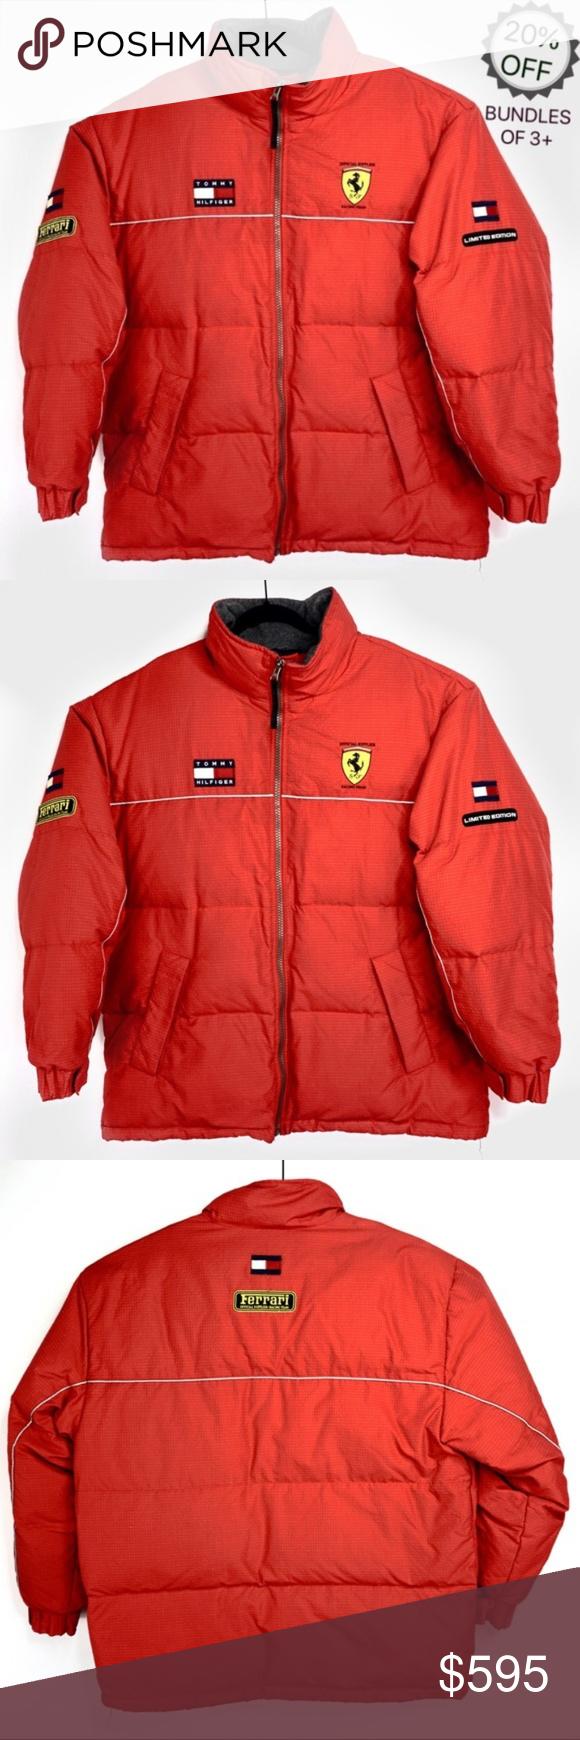 Tommy Hilfiger   Ferrari Puffer Jacket Vintage   L Tommy Hilfiger Ferrari F1 Racing Puffer Jacket Bo...